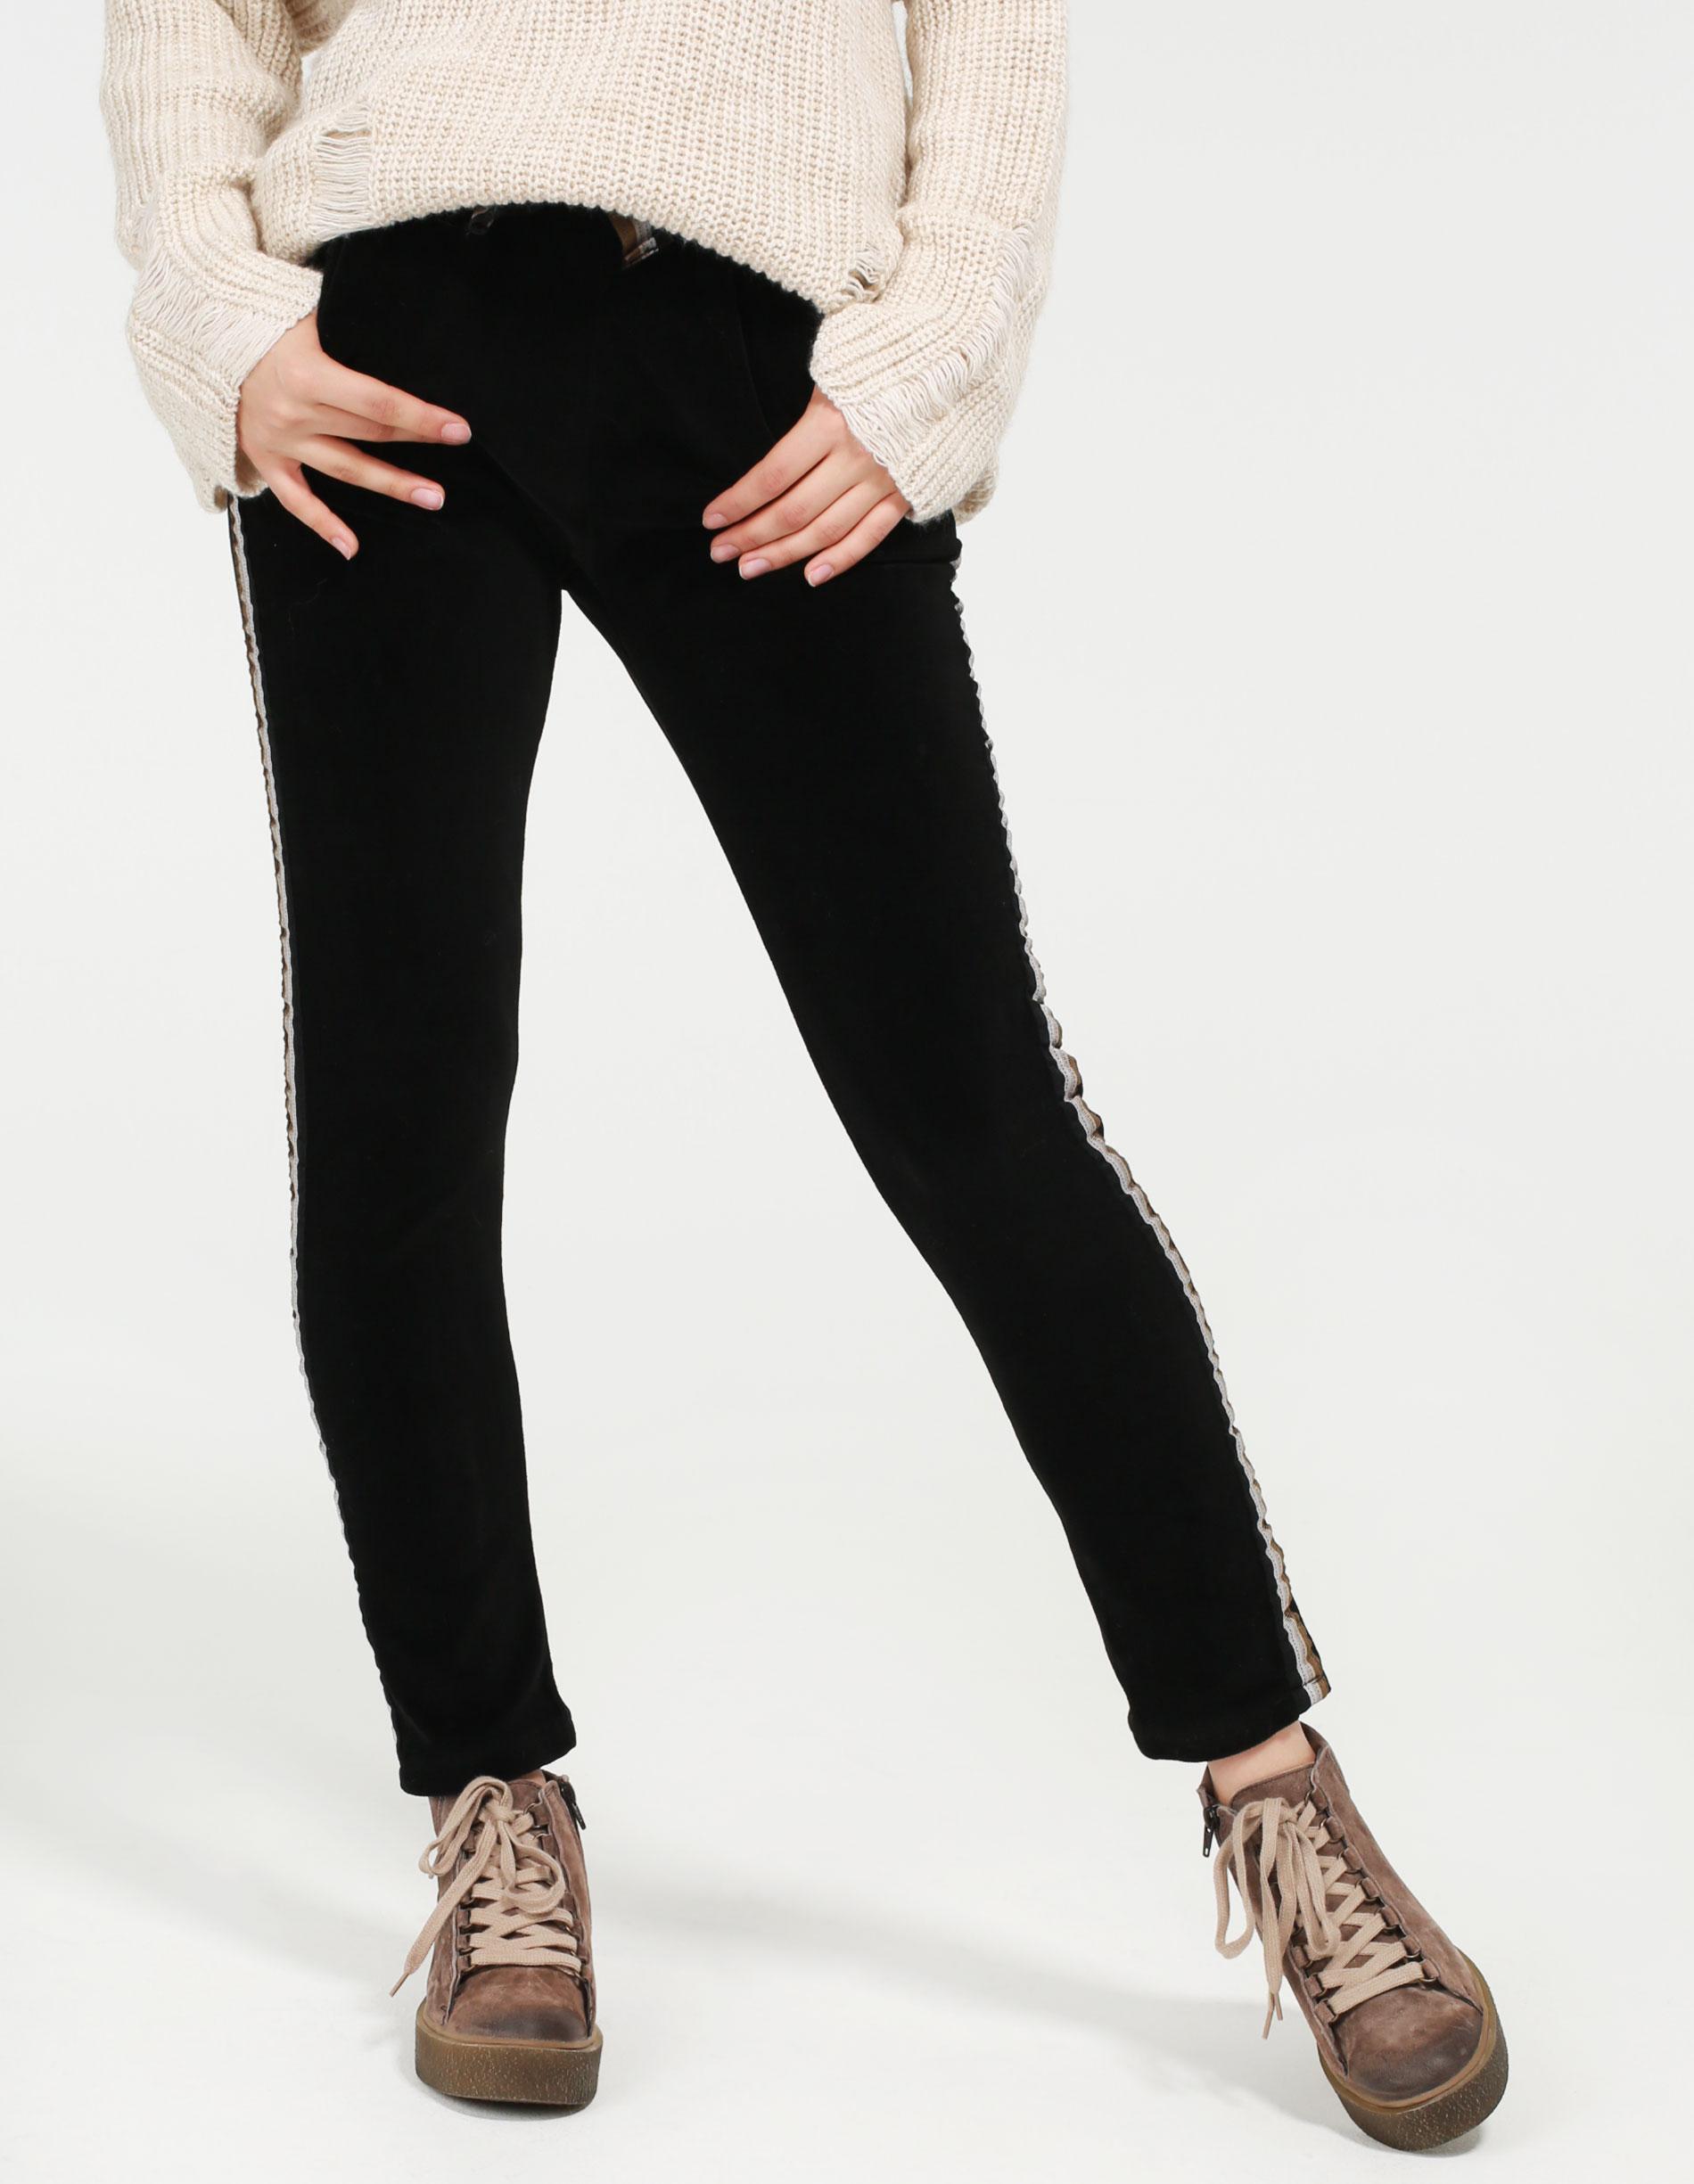 Spodnie - 146-178640 NE - Unisono